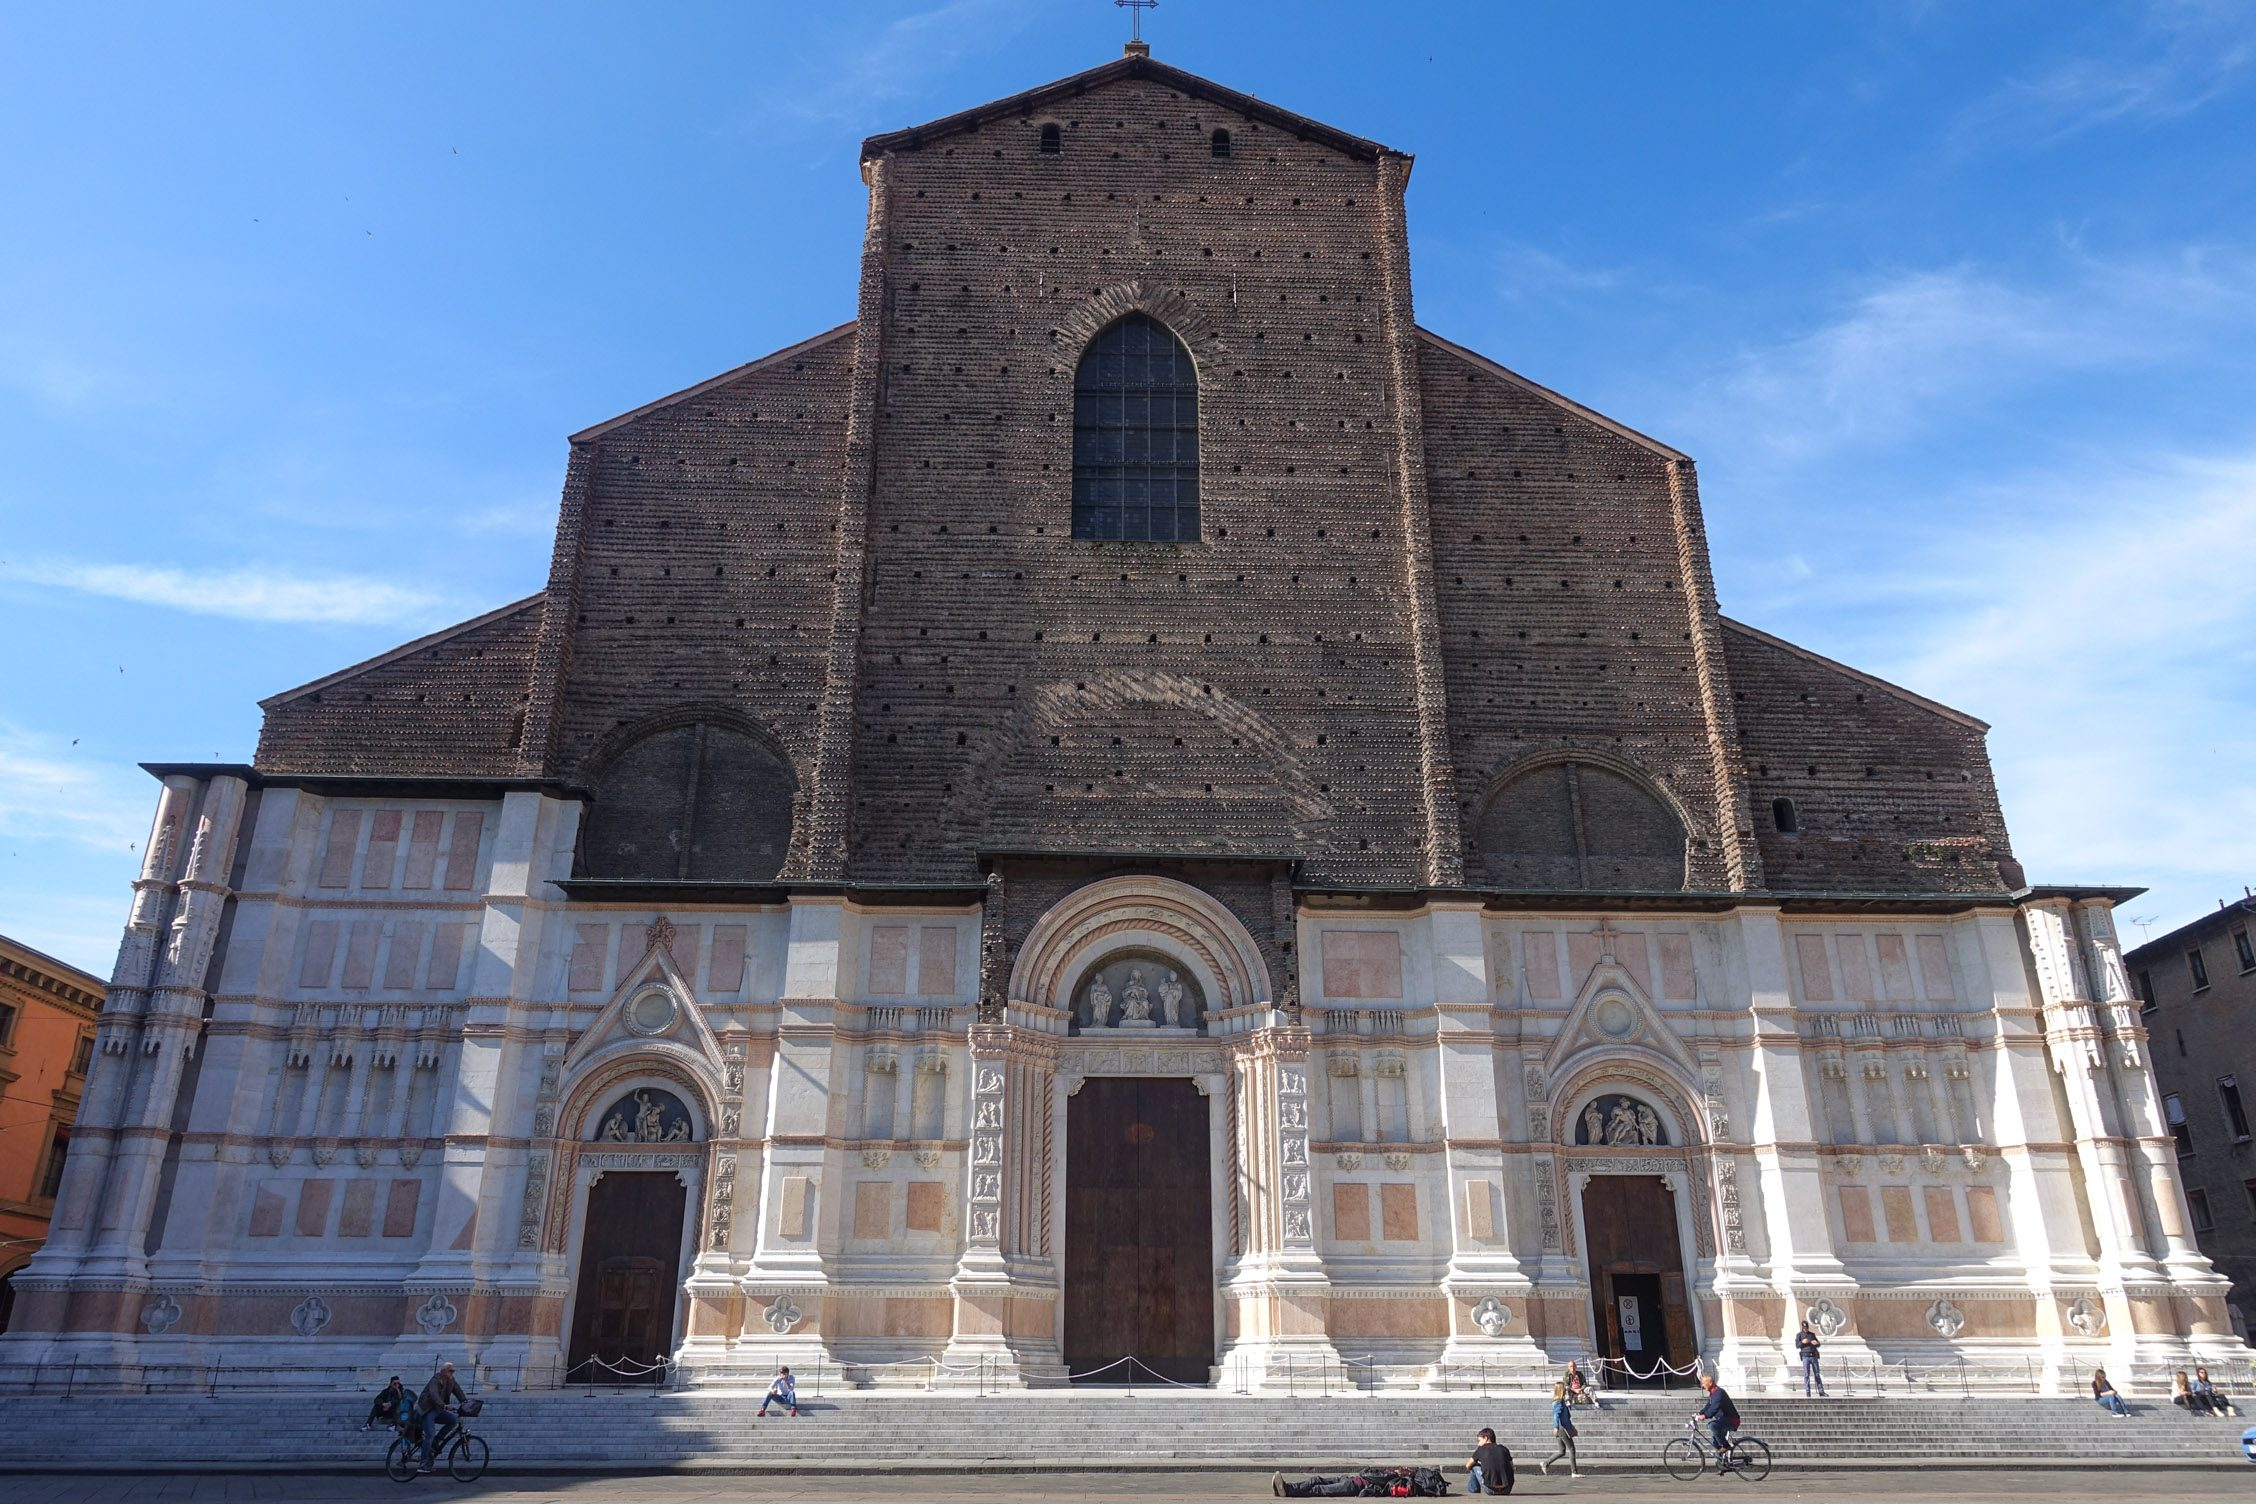 façade van de Sint-Petroniusbasiliek